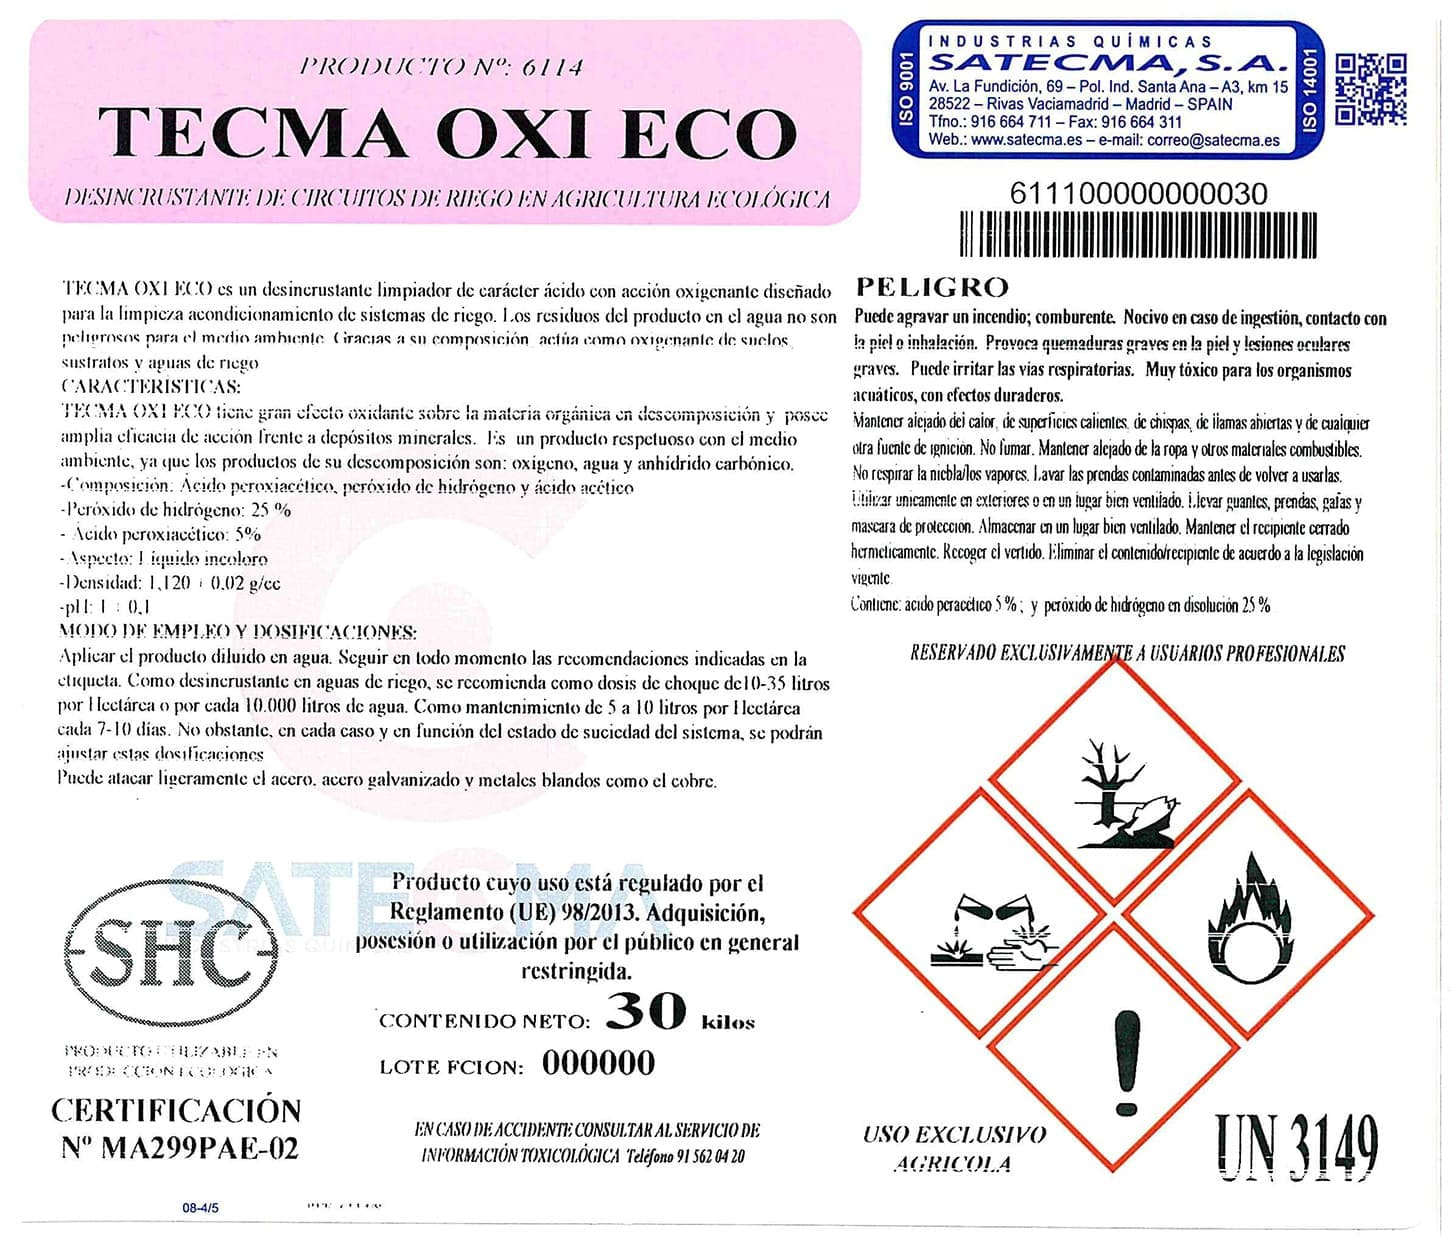 limpieza circuitos de riego TECMA-OXI-ECO-ETQ